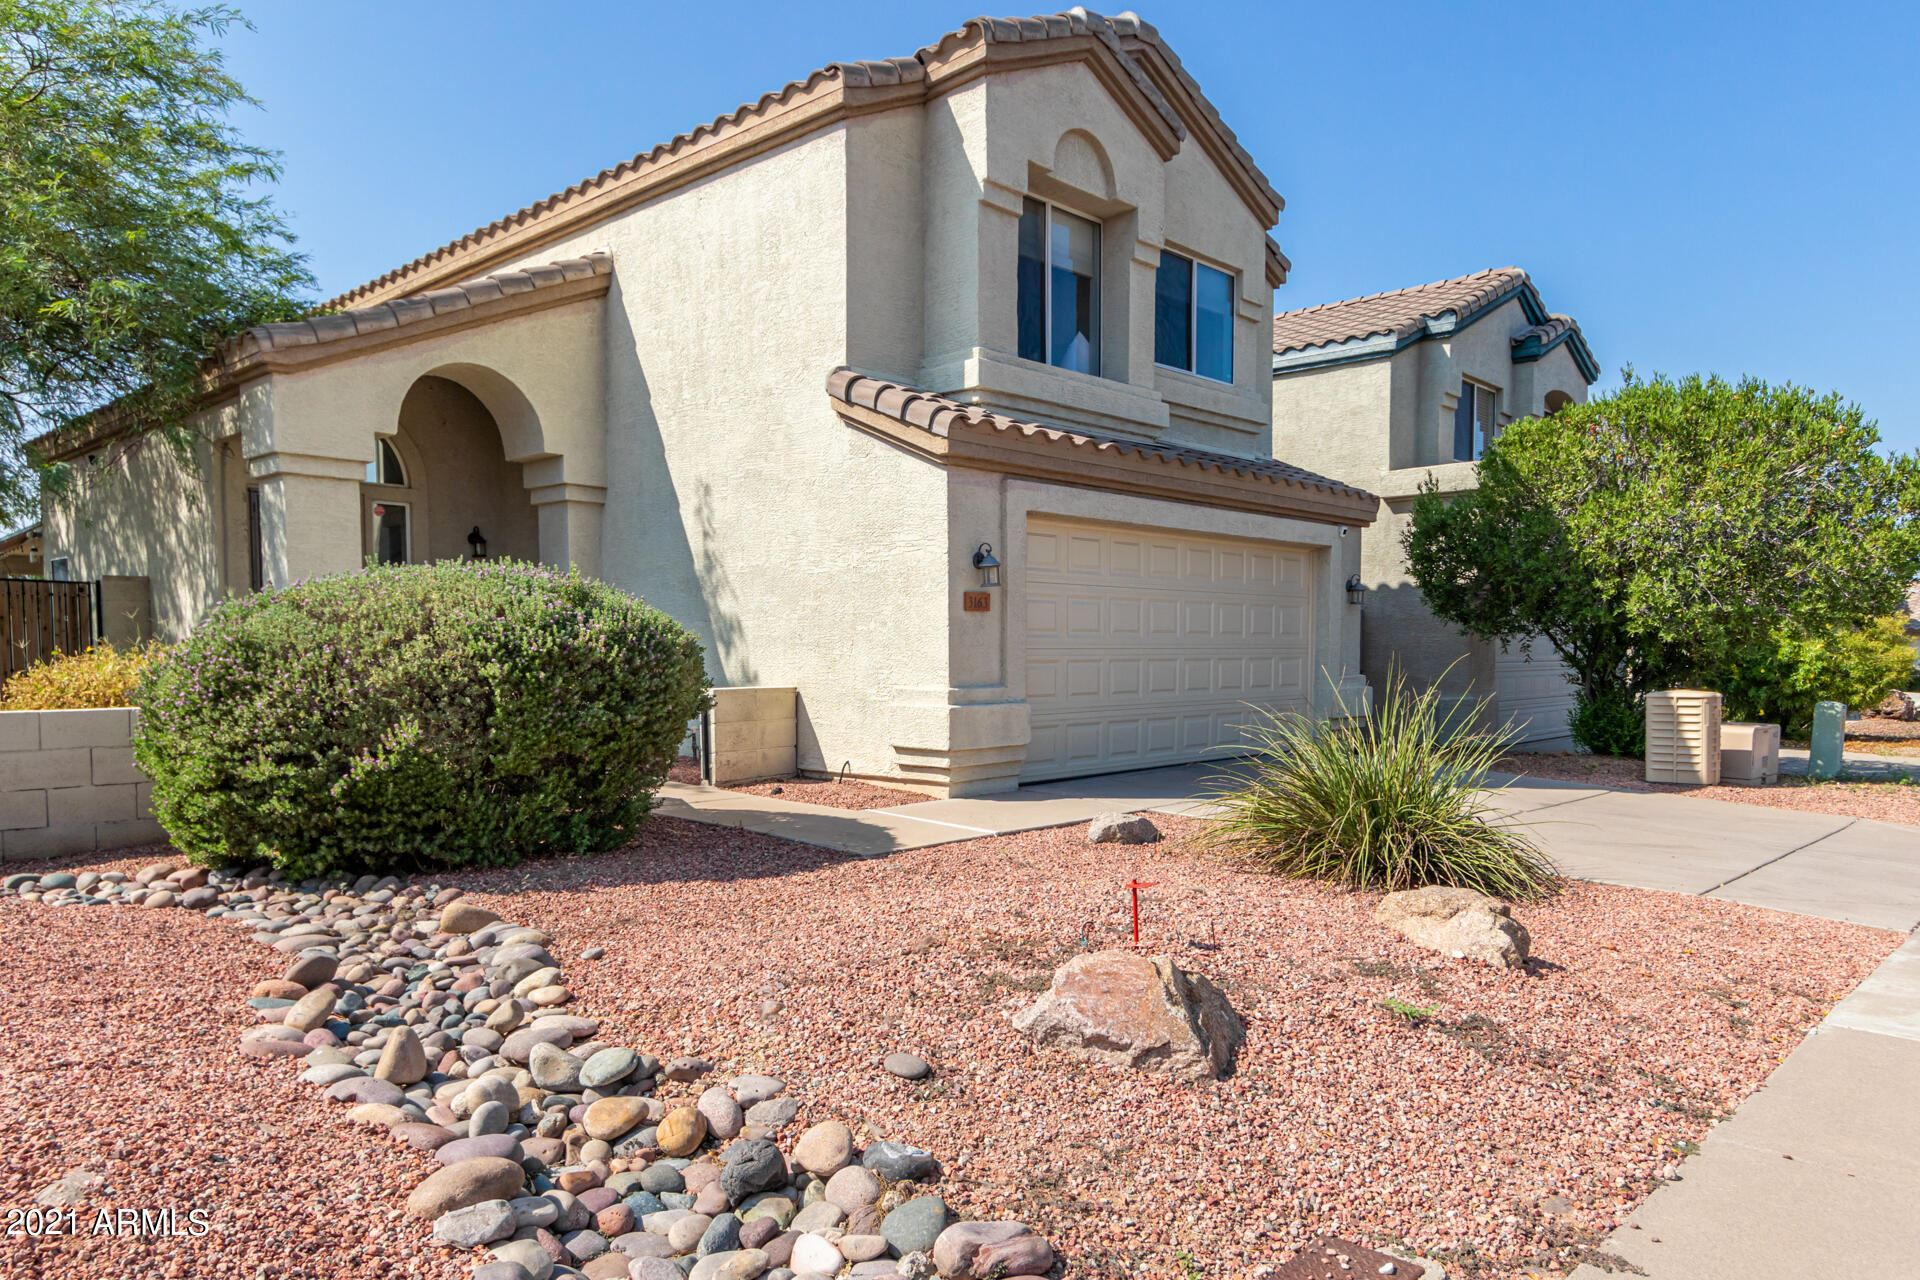 3163 E WAHALLA Lane, Phoenix, AZ 85050 - MLS#: 6286013